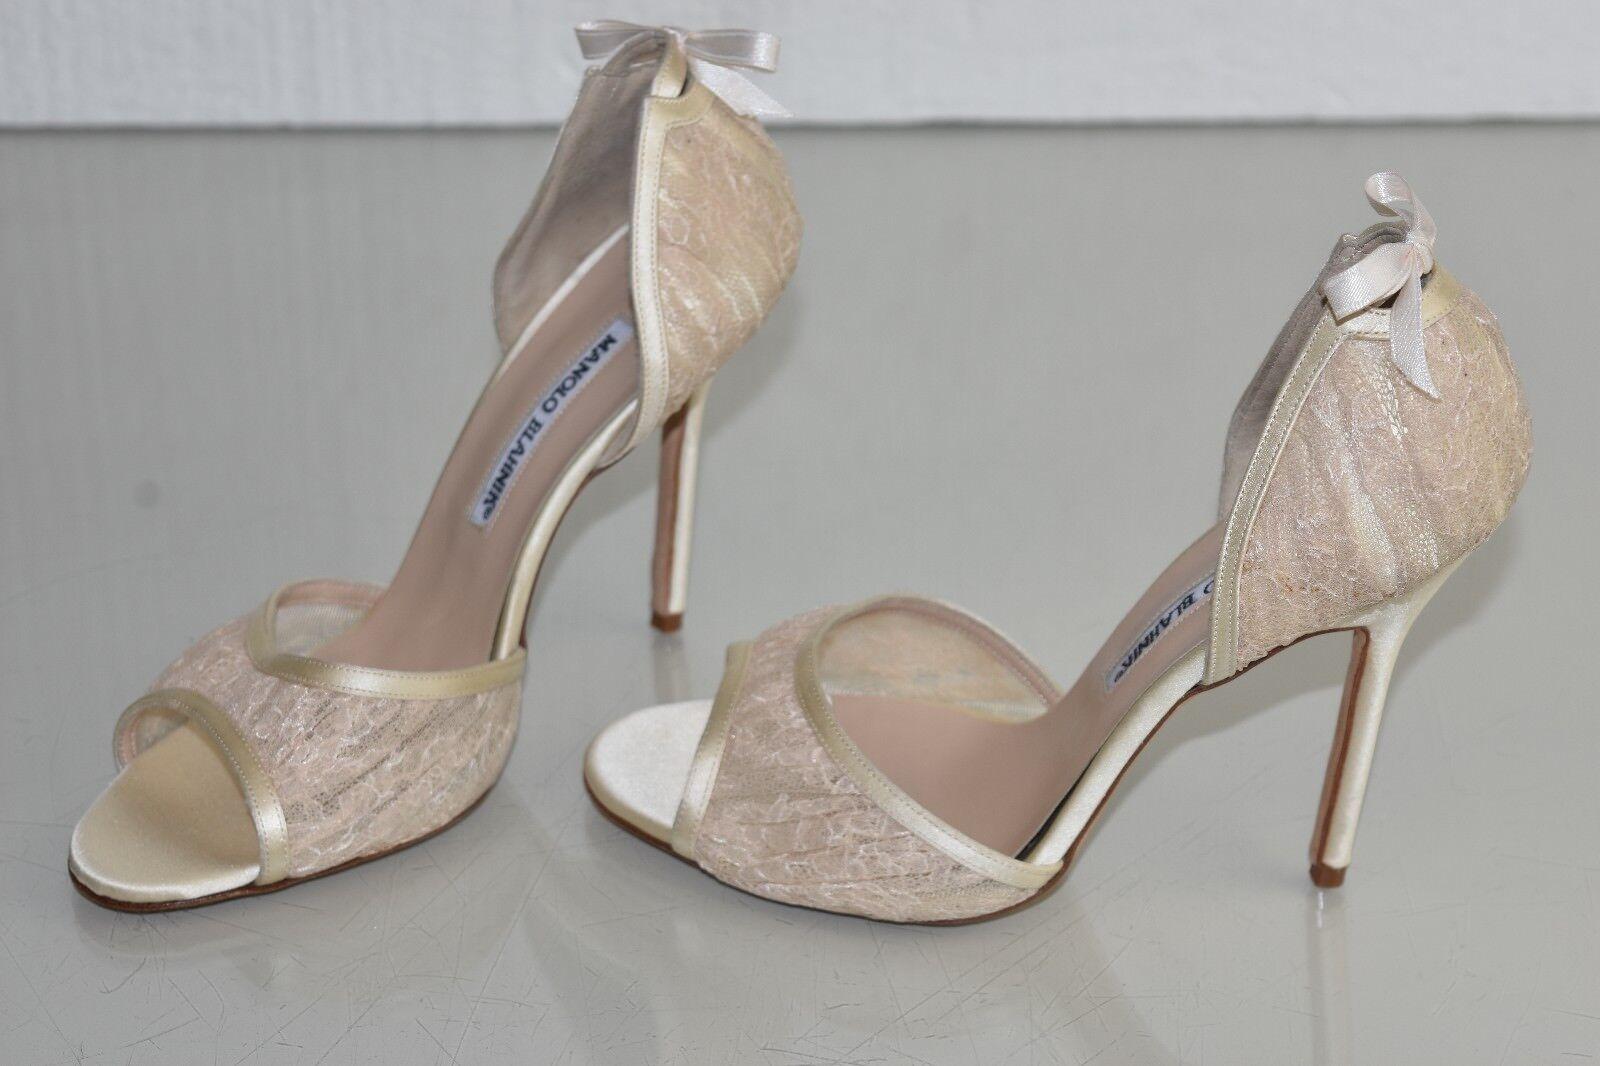 NEW Manolo Blahnik Lace Astutado Cream Ivory Lace Peep Toe Bow Wedding Shoes 37